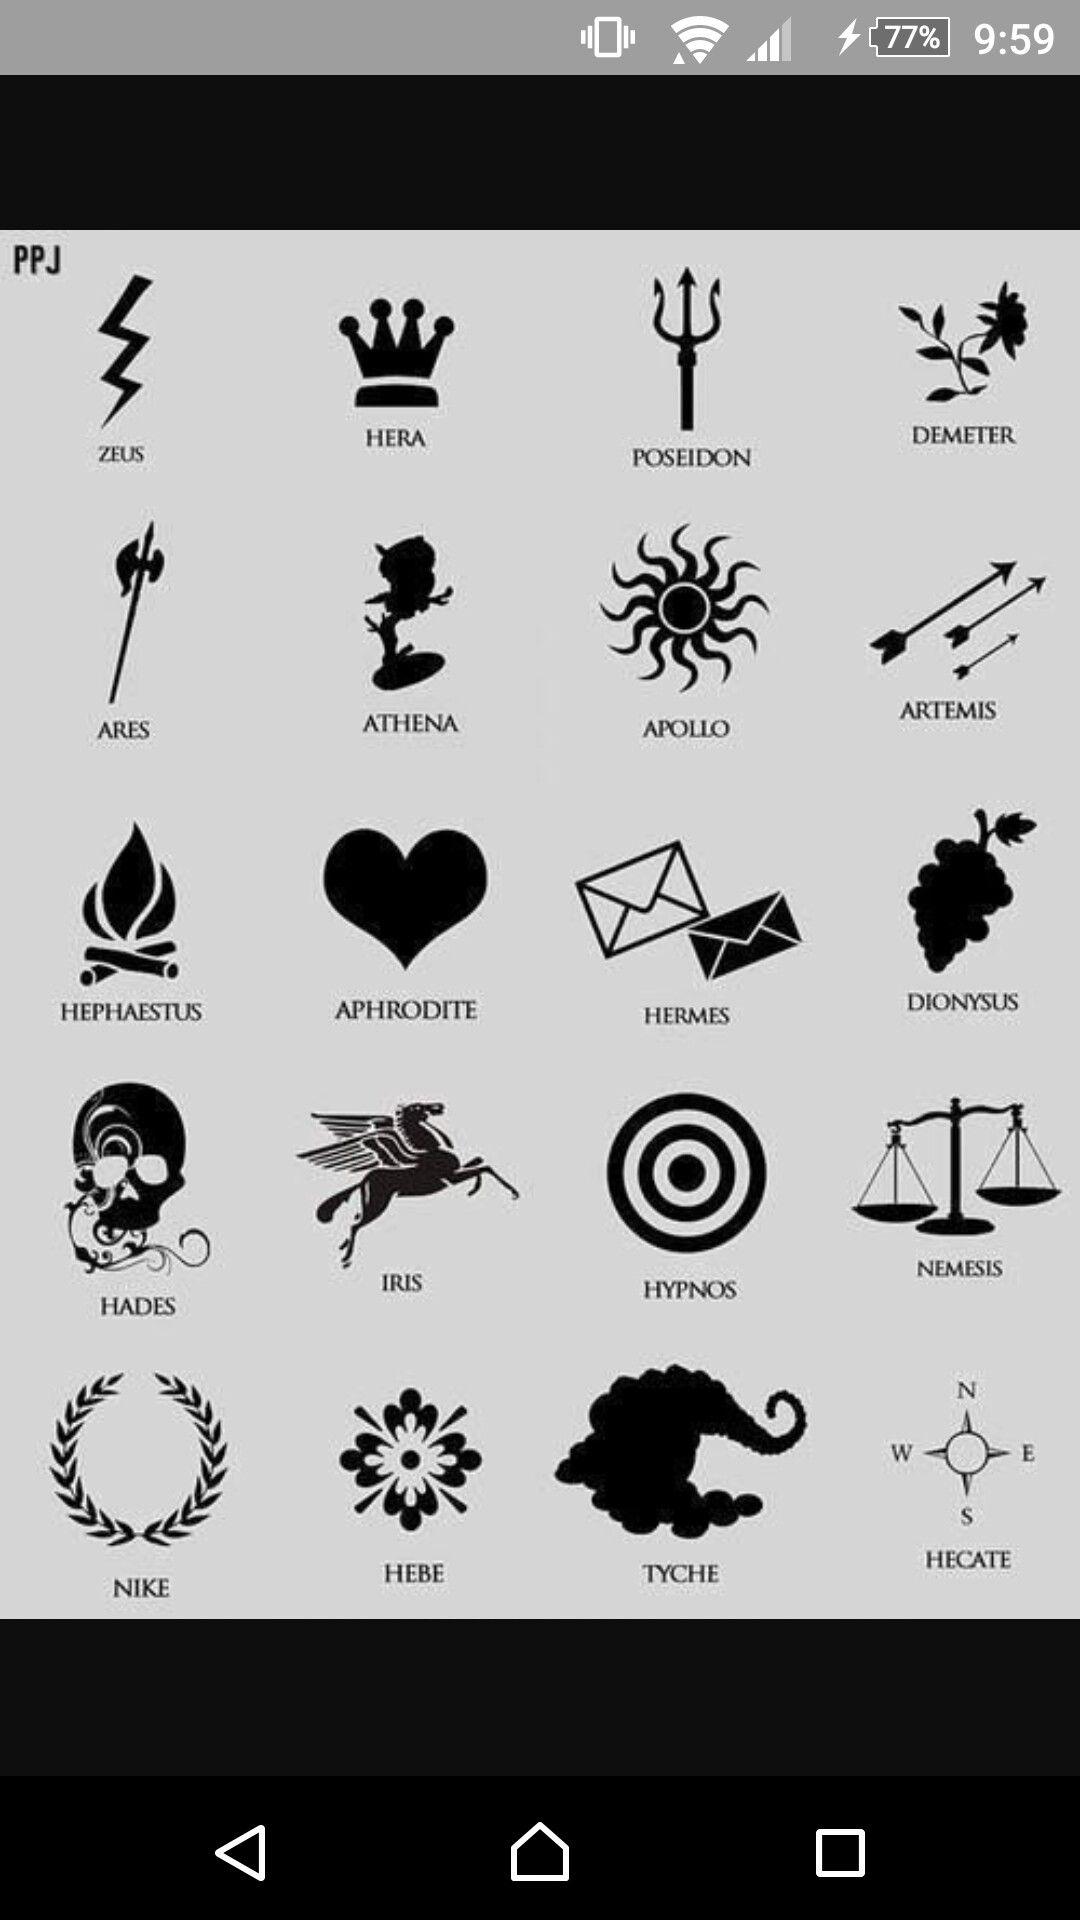 Greek gods symbol images symbol and sign ideas god symbols im probly athena hermes hades or tyche rick god symbols im probly athena hermes buycottarizona